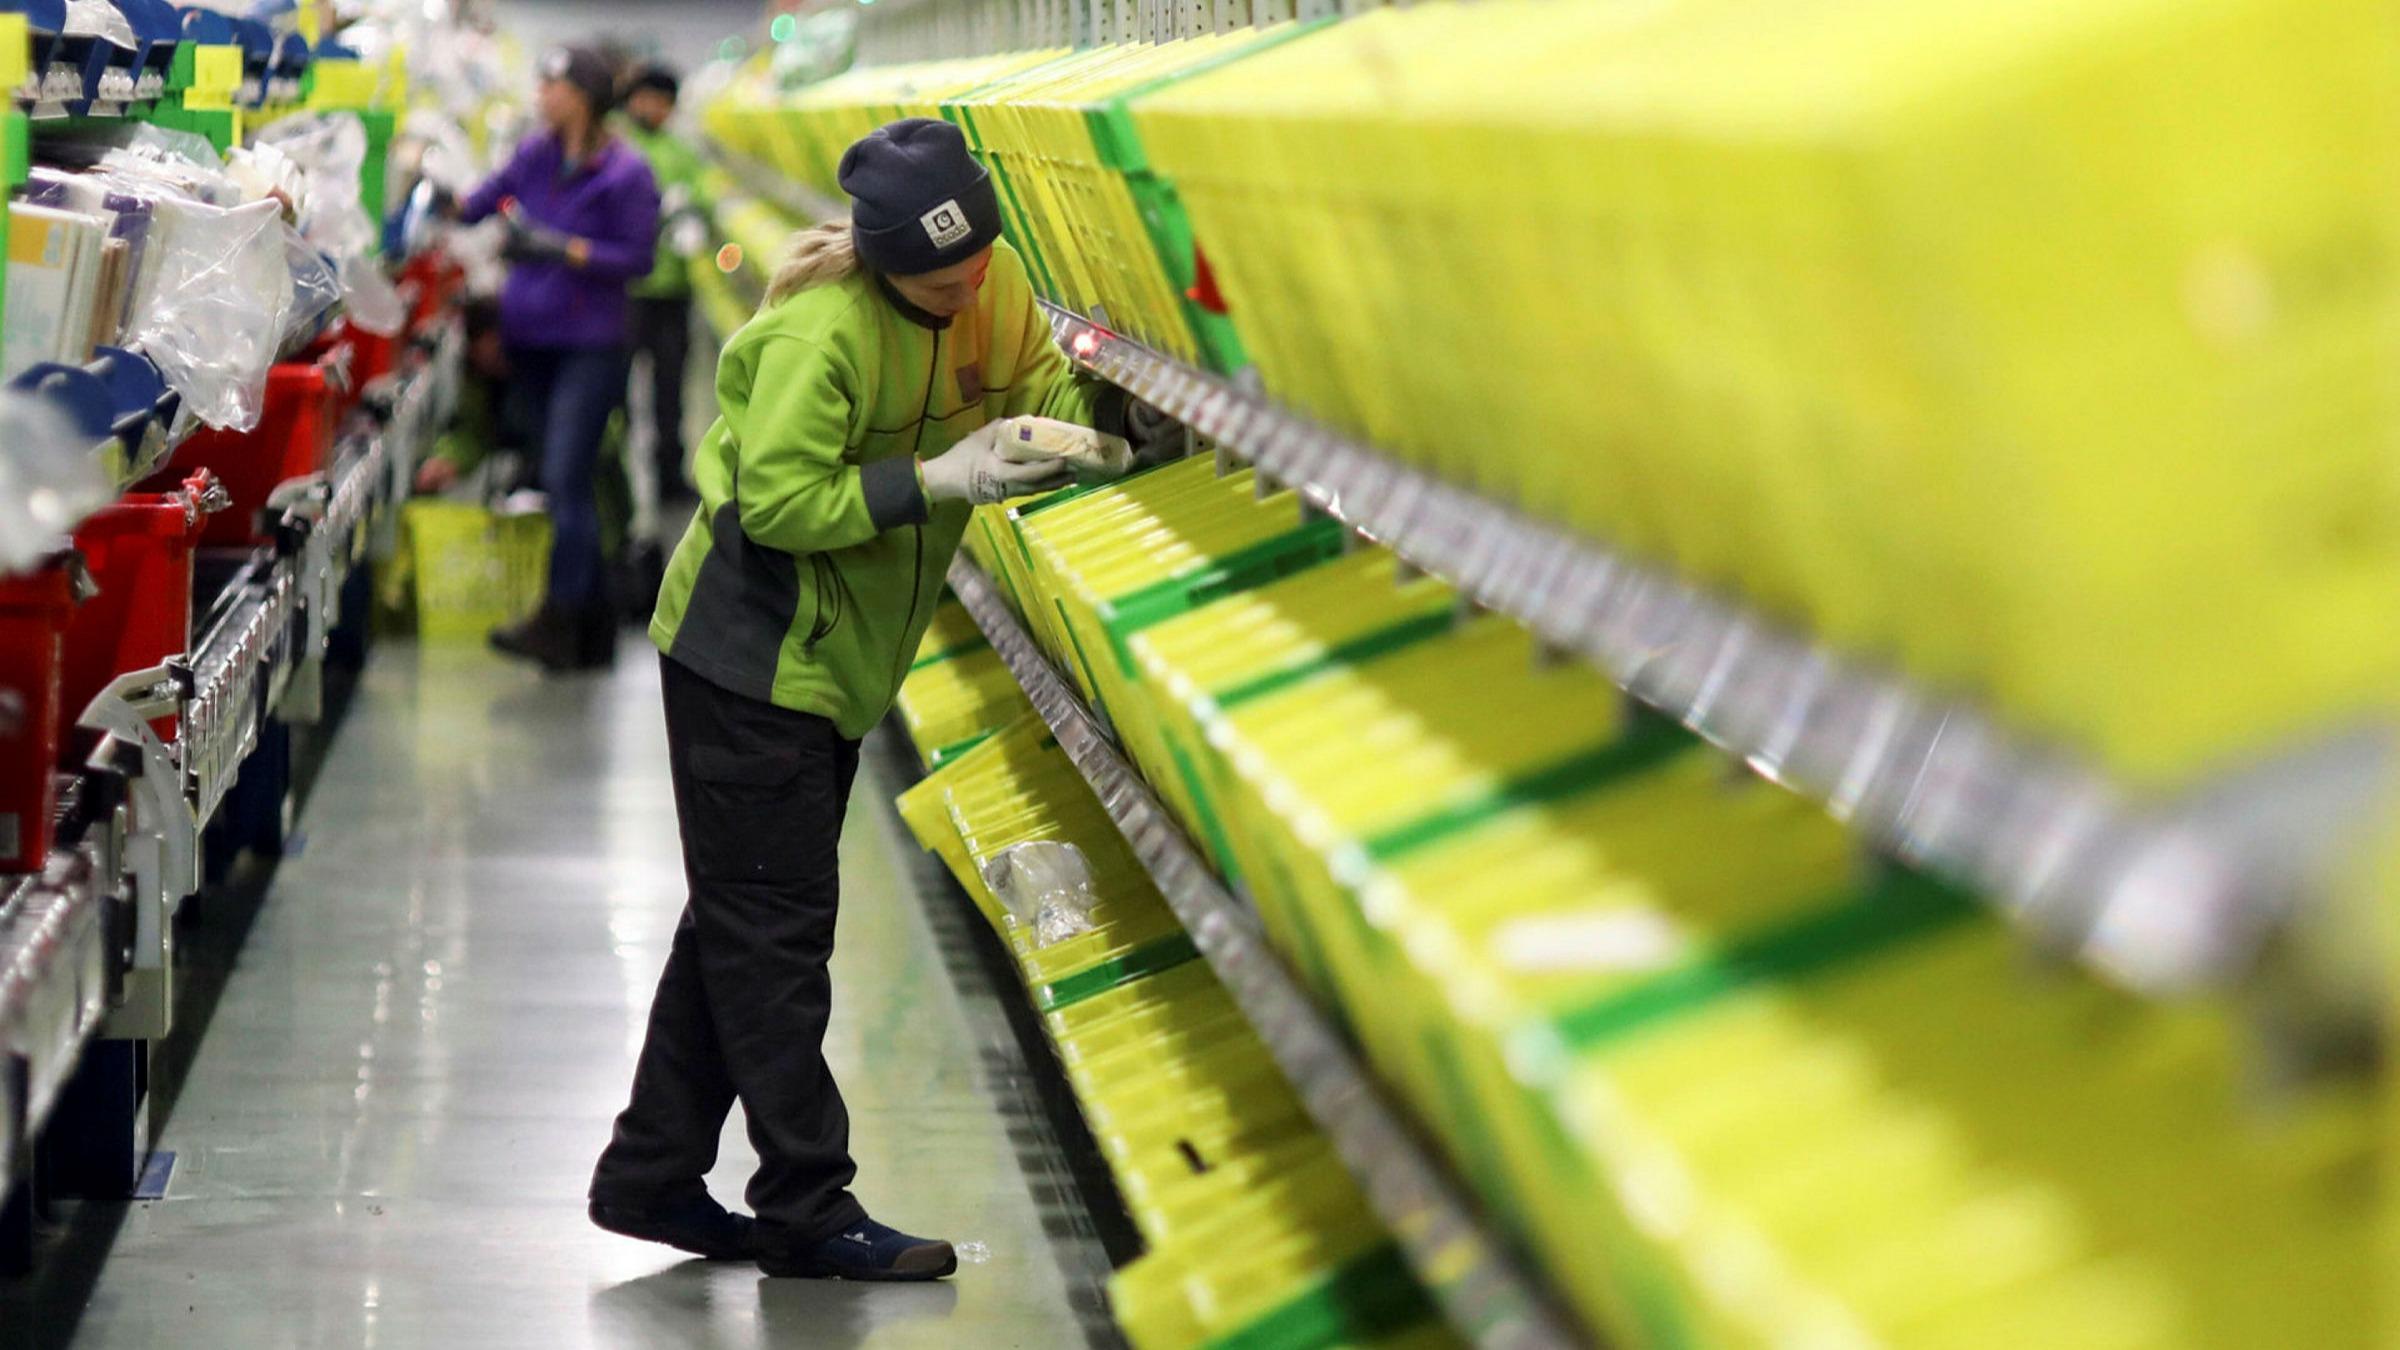 ft.com - Jonathan Eley - Ocado steals Tesco crown as UK's most valuable food retailer